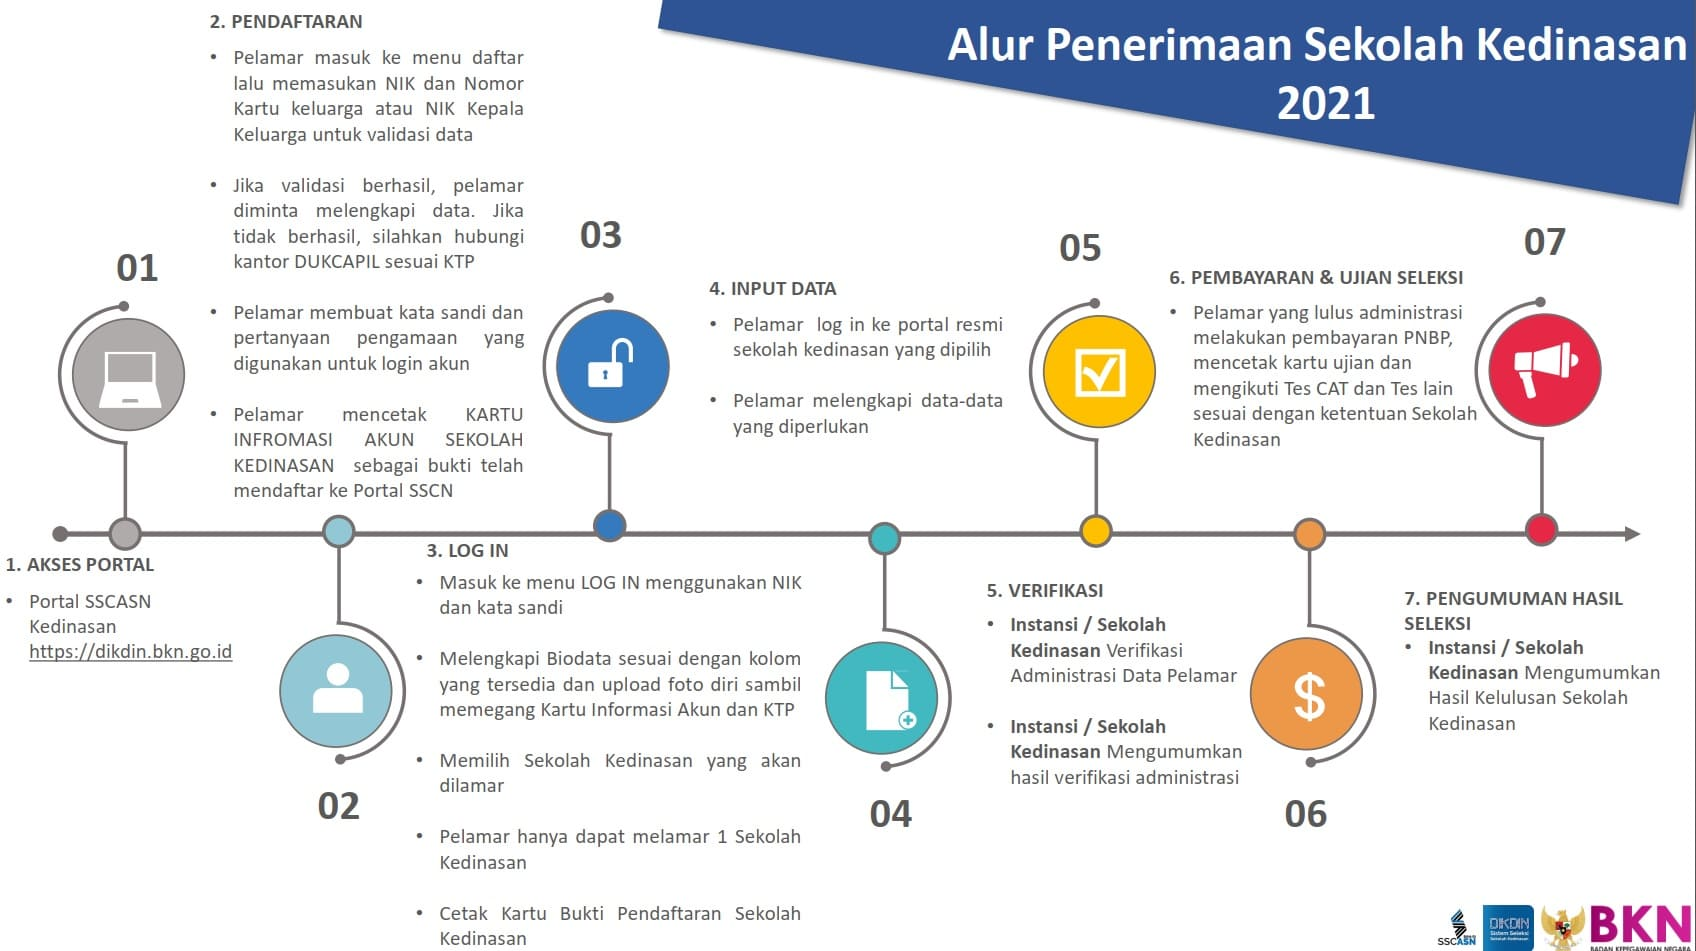 ALUR CARA PENDAFTARAN IPDN 2021